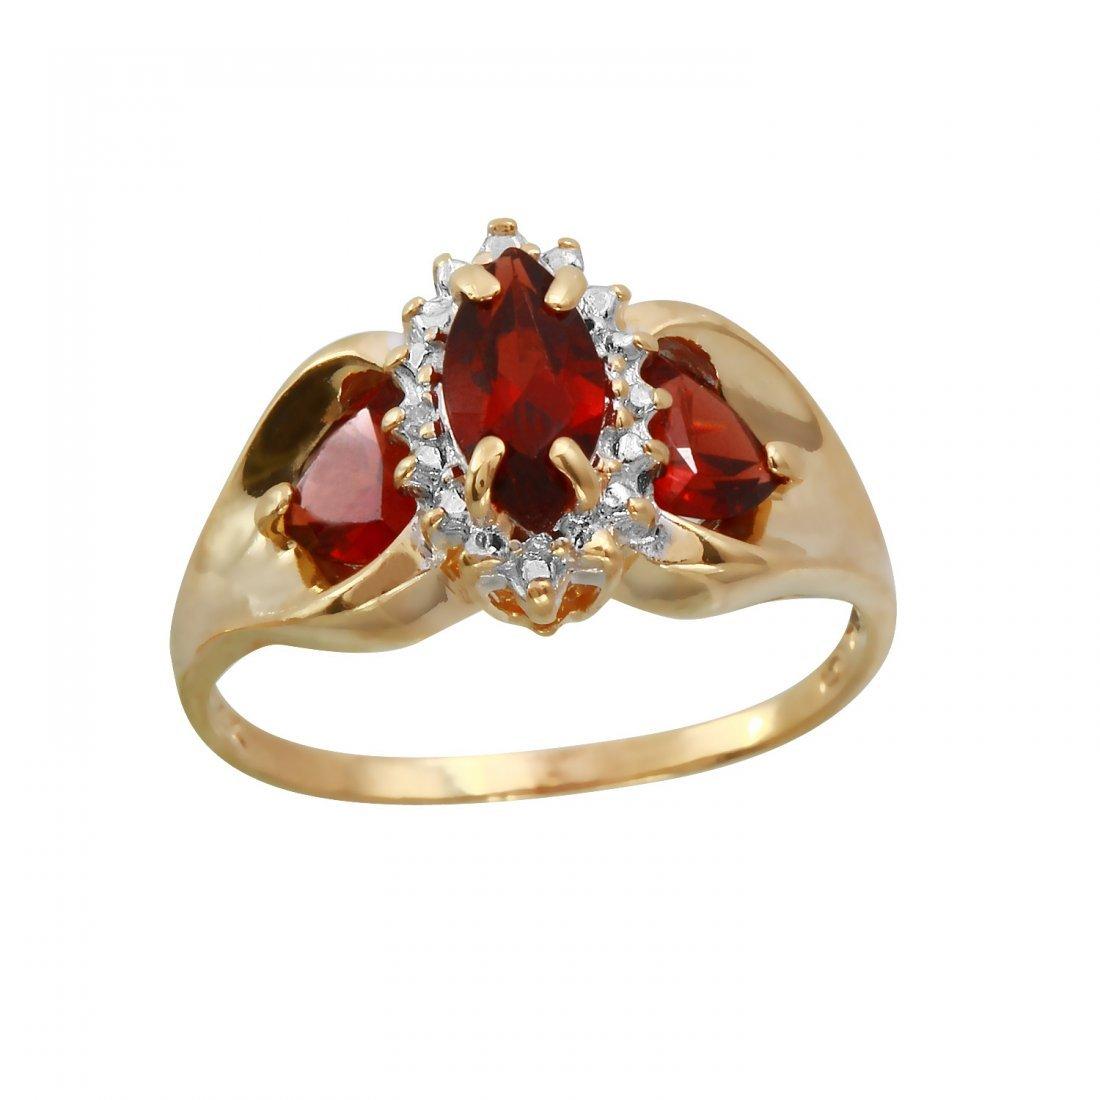 Ladies 1.31 CTW Garnet And Diamond 14K Yellow Gold Ring